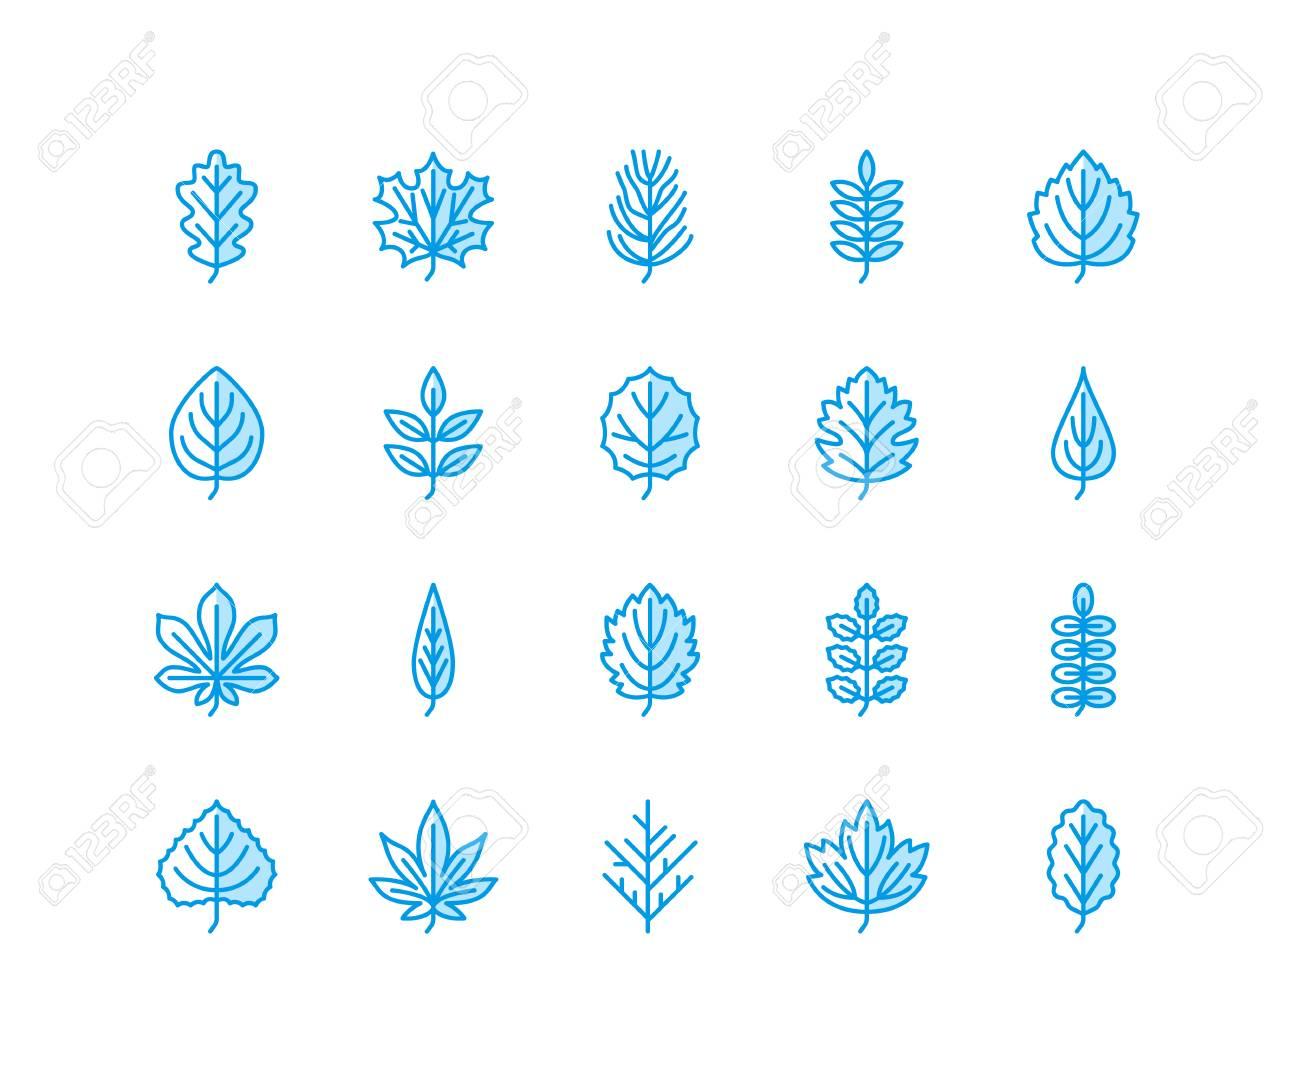 Autumn leaves flat line icons. Leaf types, rowan, birch tree, maple, chestnut, oak, cedar pine, linden,guelder rose Thin signs of nature plants. - 110023448